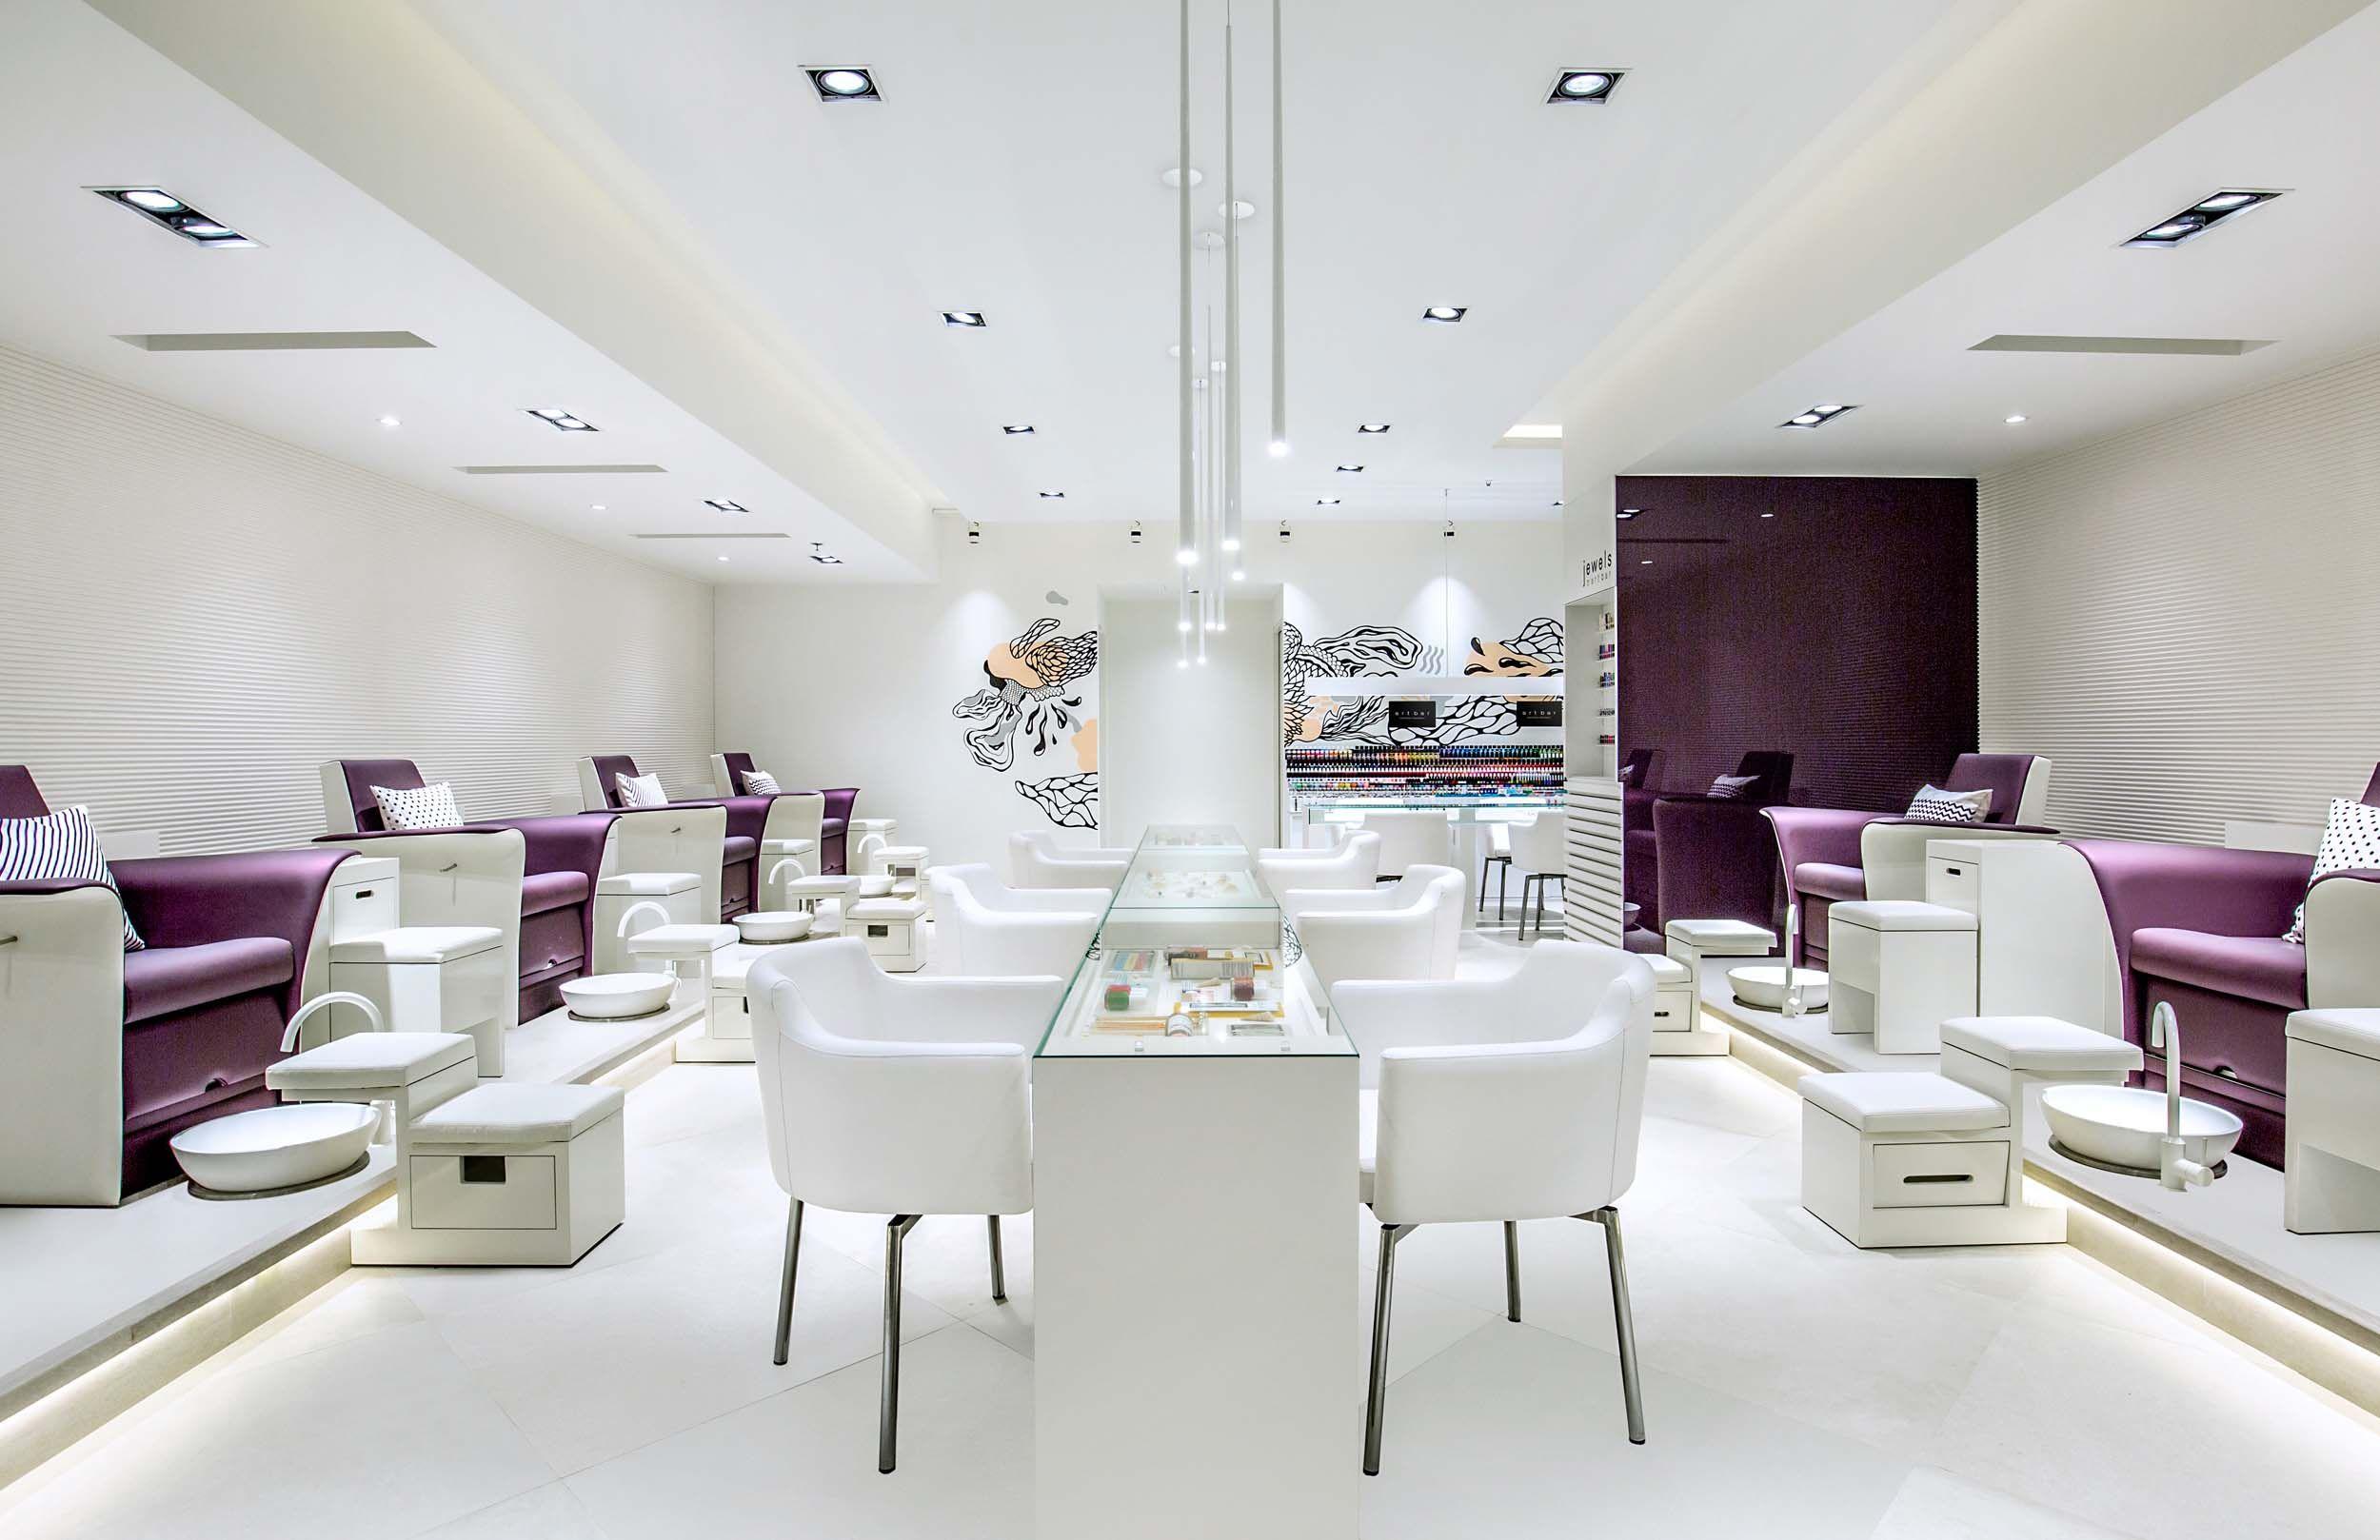 Vip Room Umm Suqeim Boutique Spa Salon Furniture Vip Room